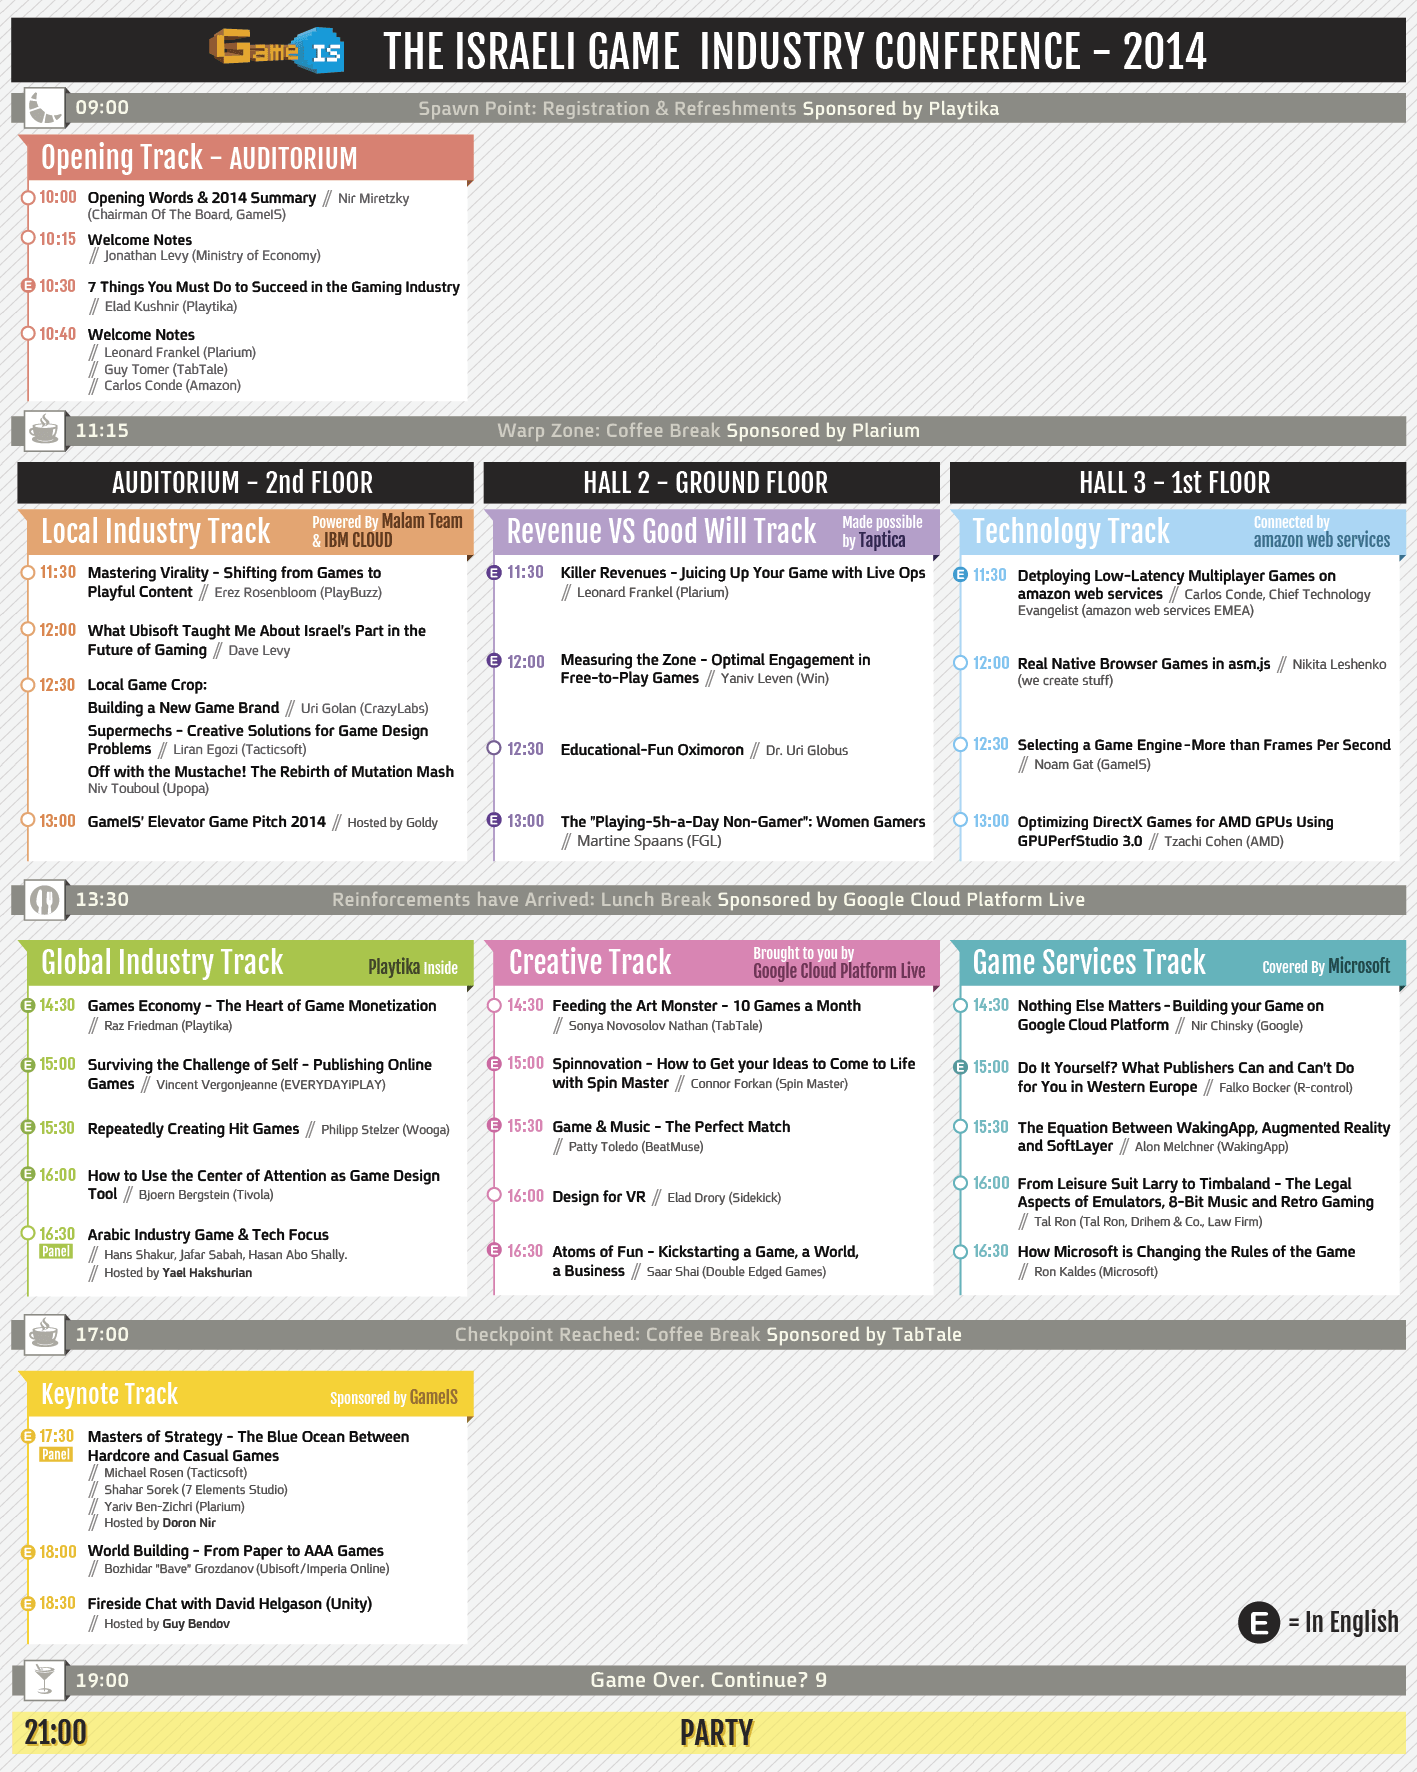 GameIS 2014 Program